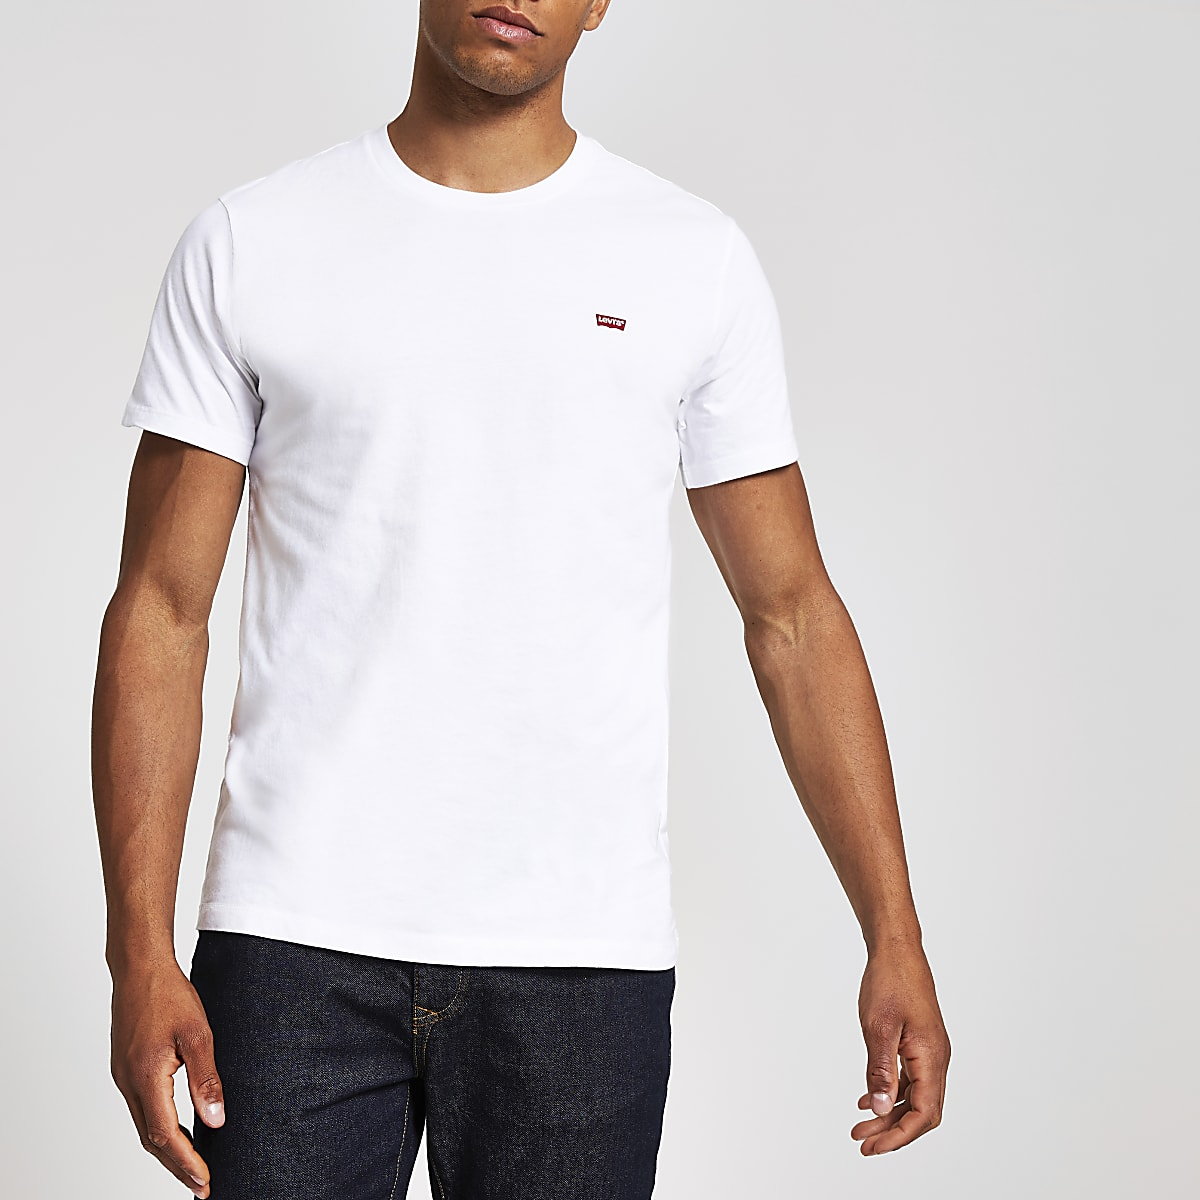 Levi's – Original – Weißes T-Shirt